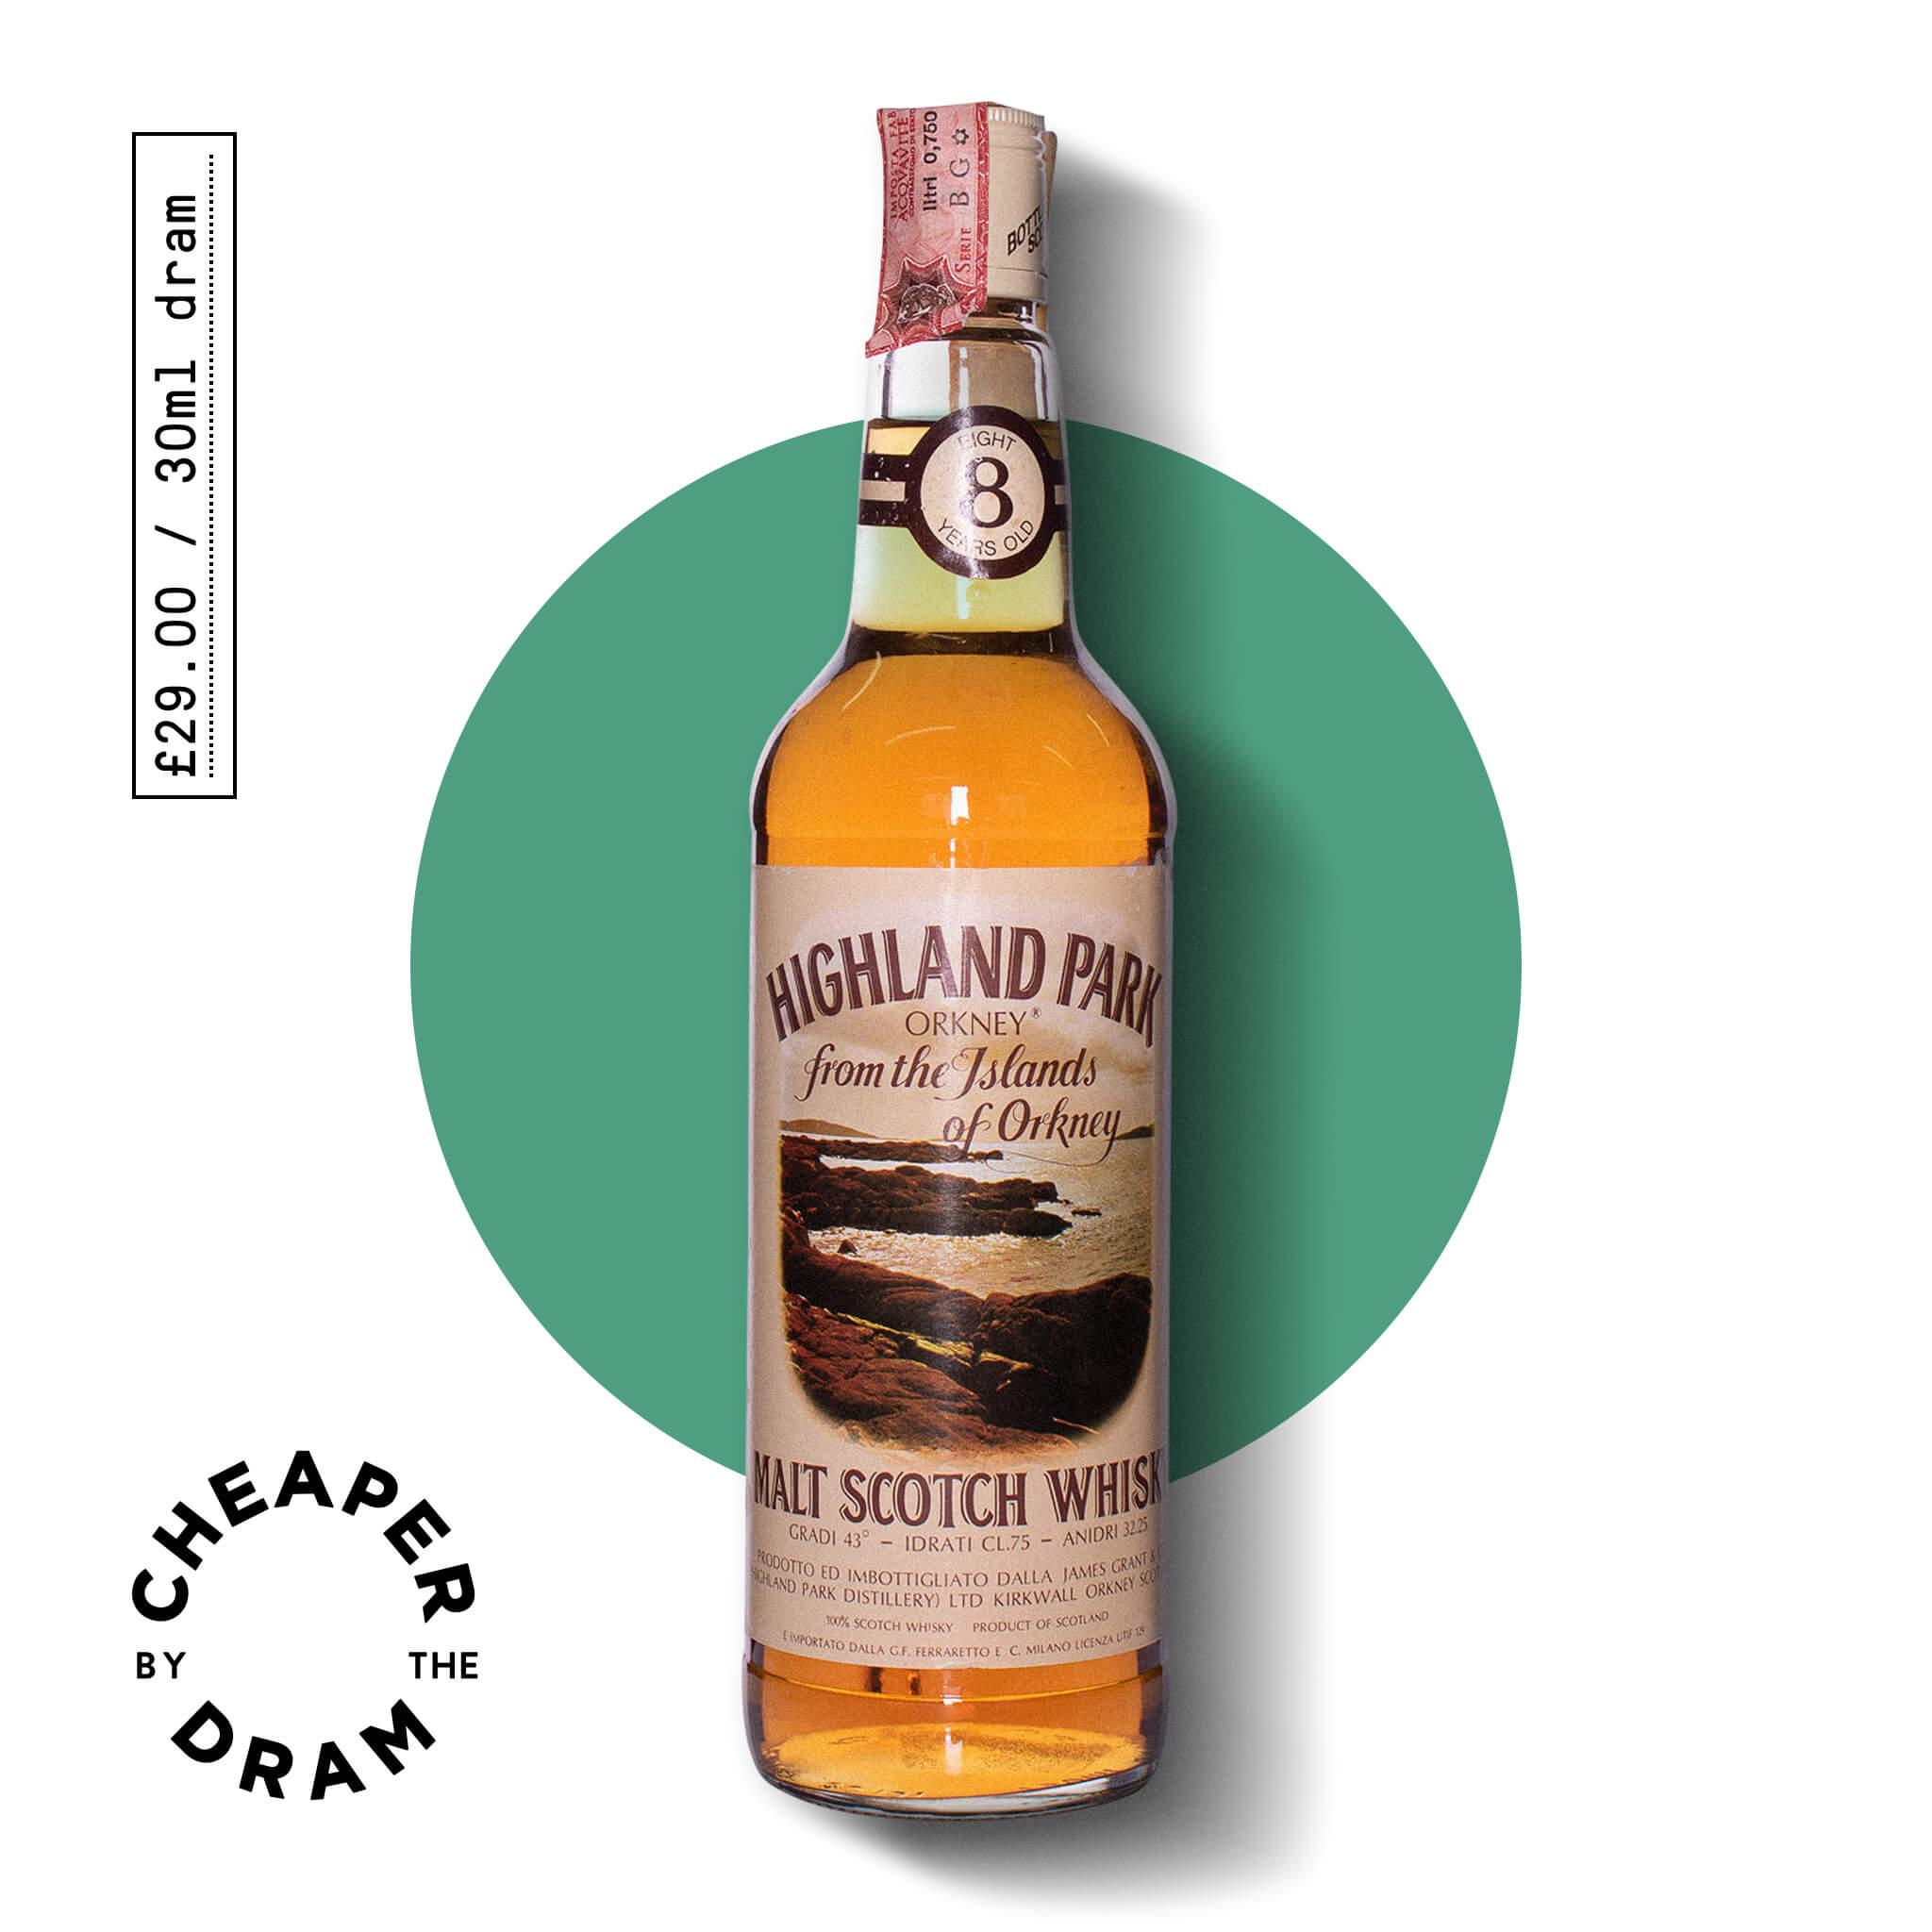 A bottle of CBTD NO.23 Highland Park 8 Year old 1970s